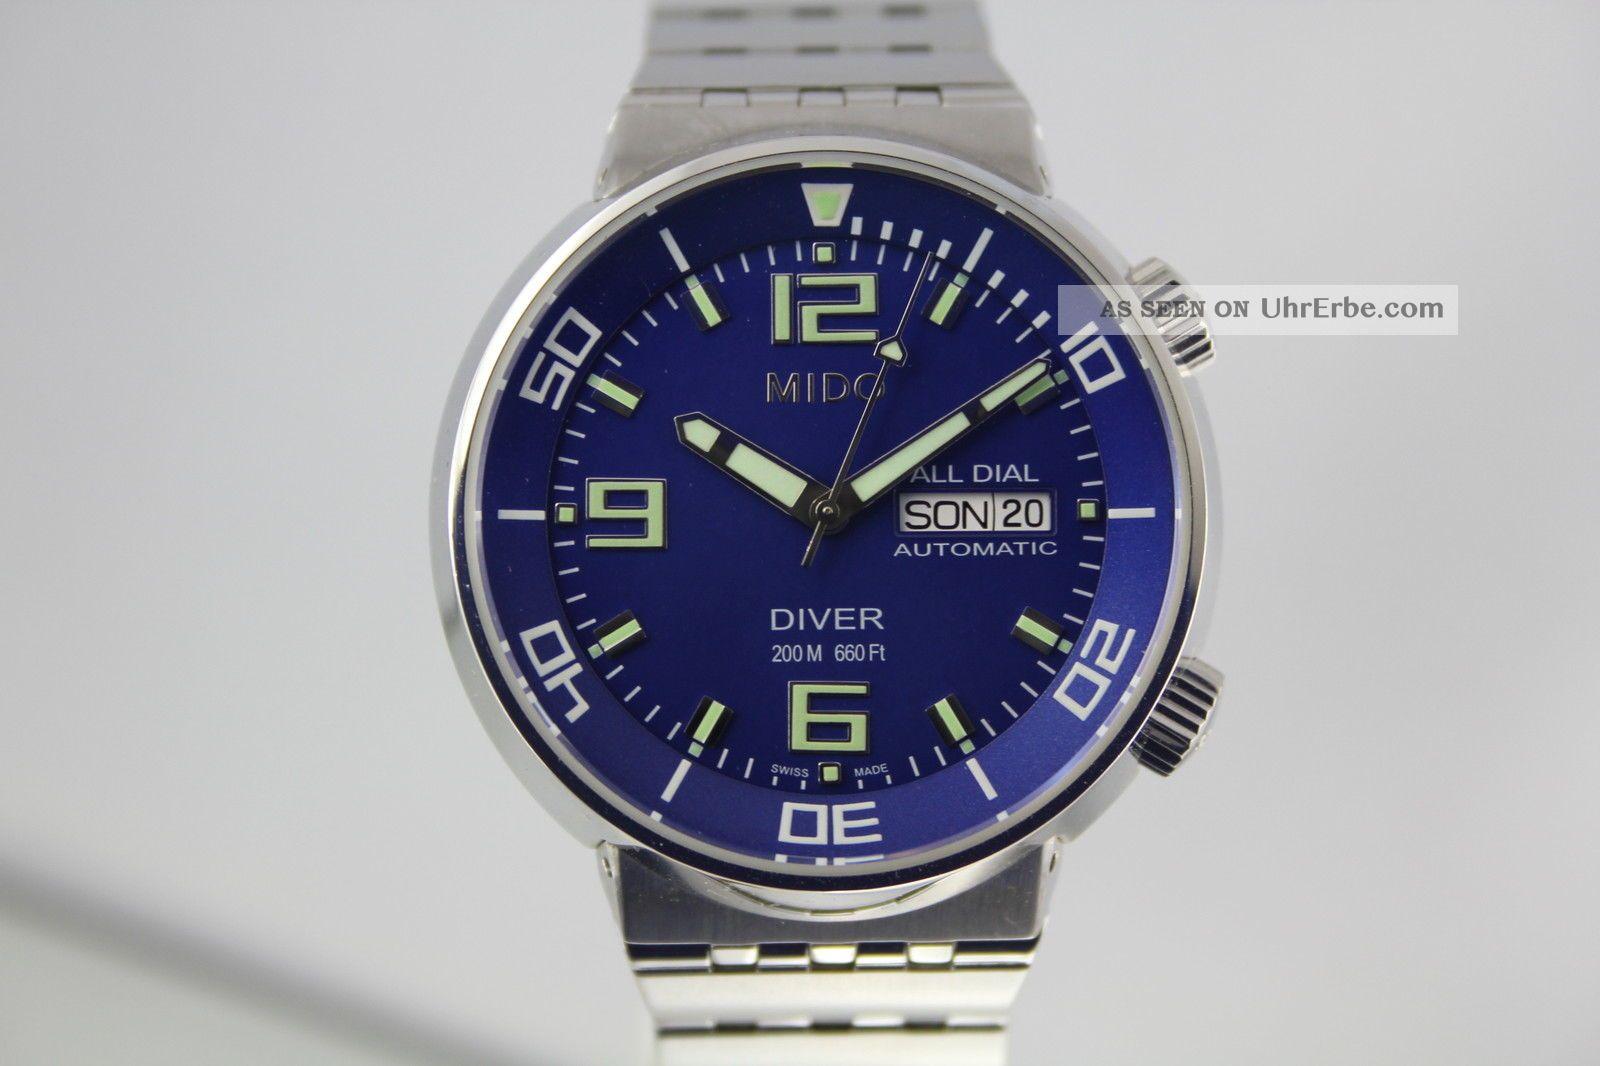 Mido Diver All Dial 8370 1a,  Stahlband,  Box Armbanduhren Bild